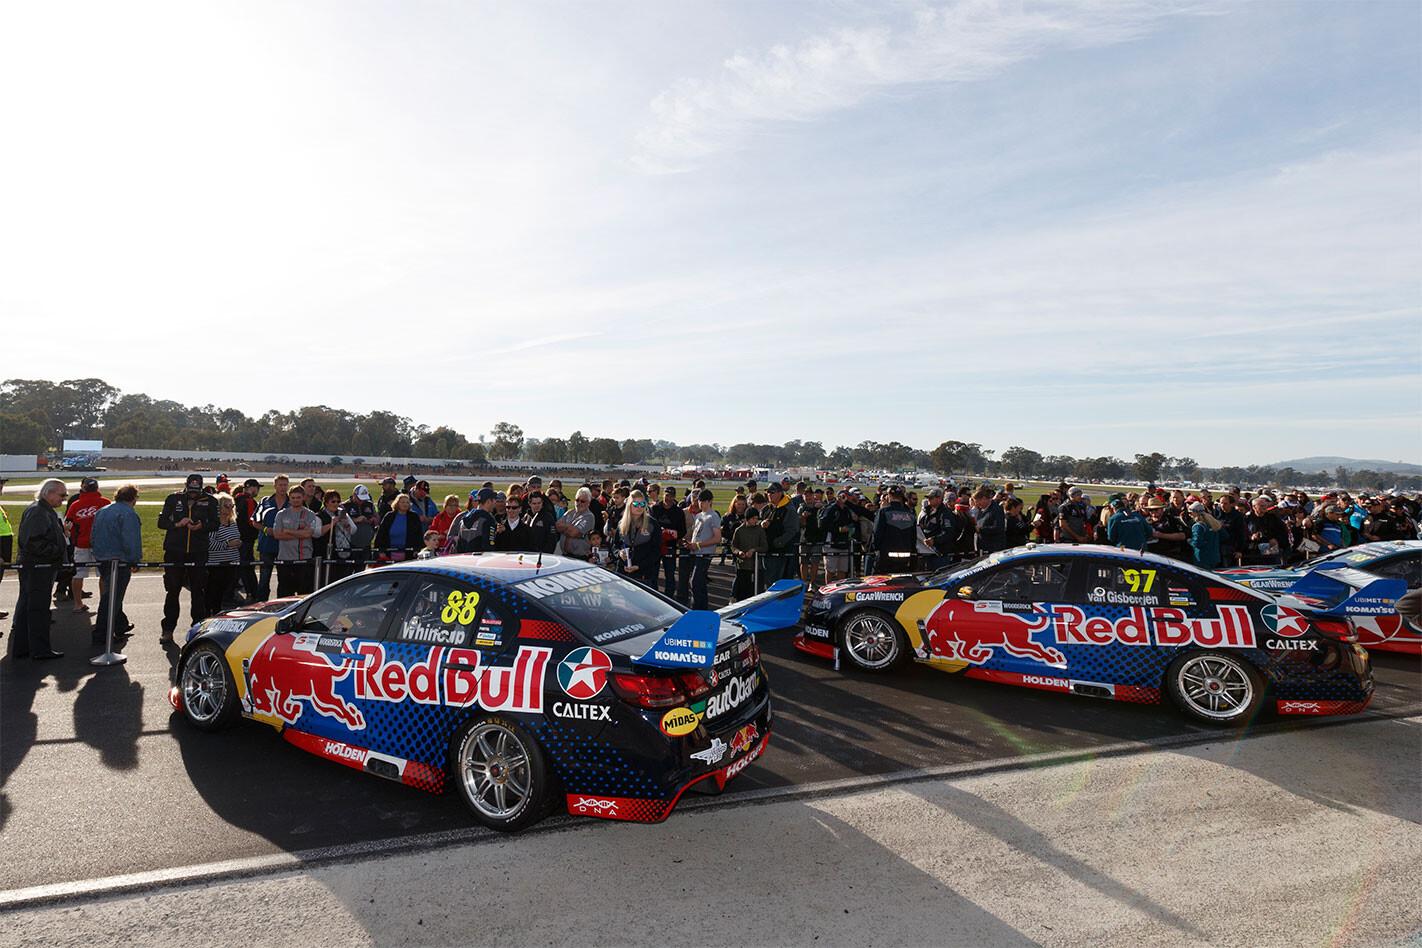 Red Bull Racing V8 Supercars